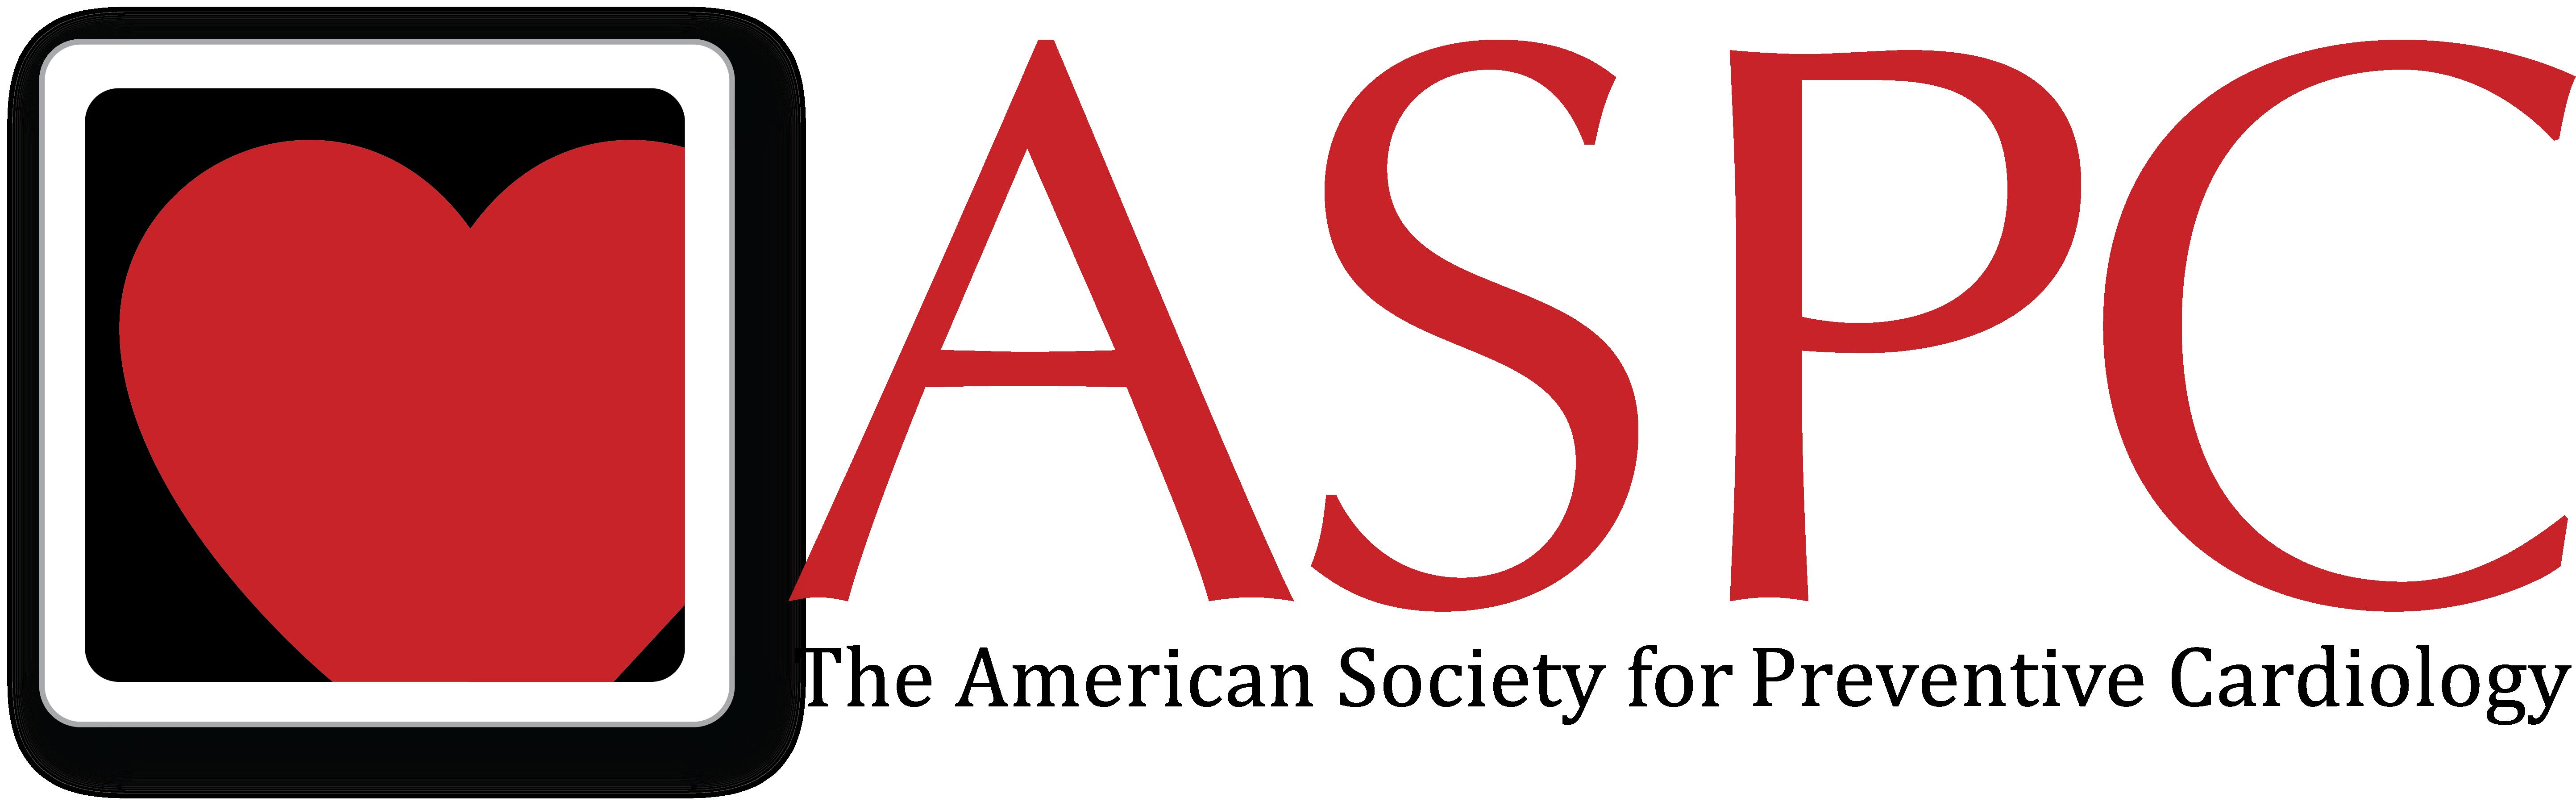 Strategic Alliance Partnership | <b>American Society for Preventive Cardiology</b>